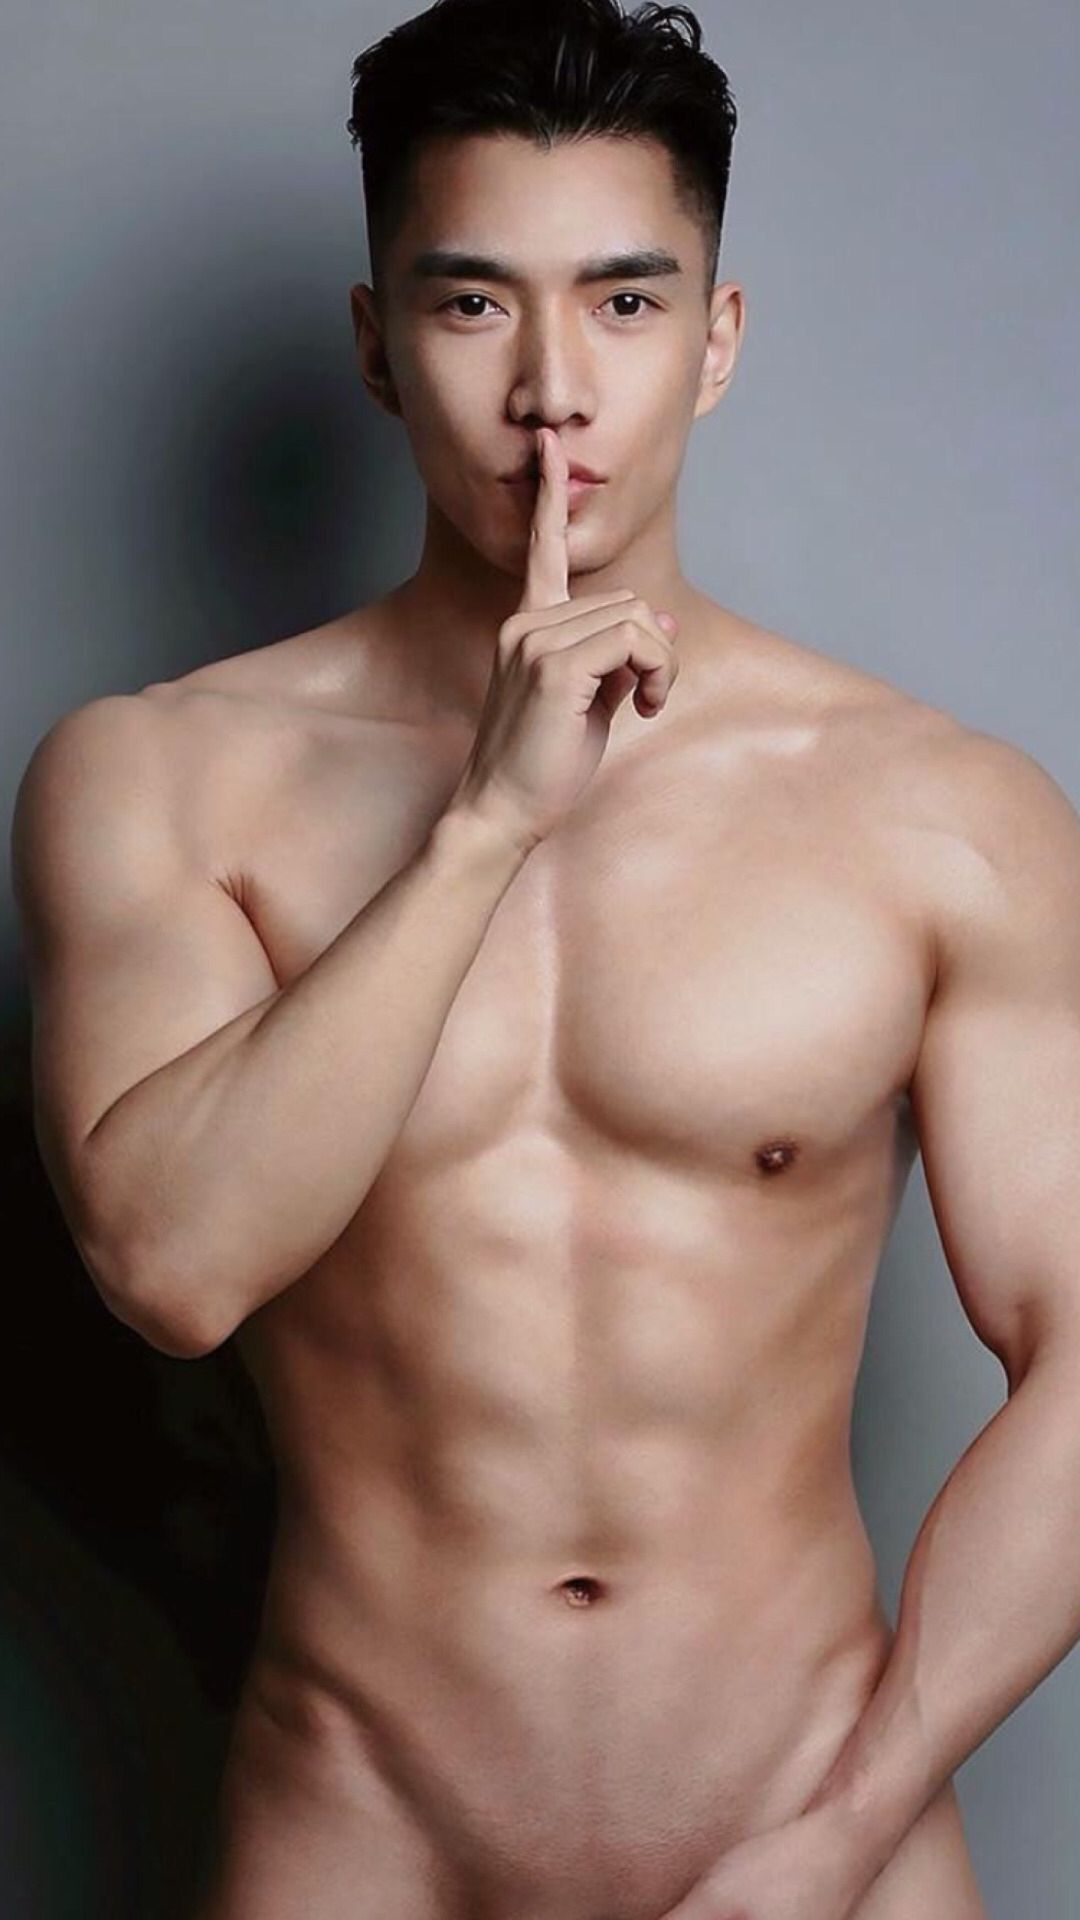 Asian sexy hot dick model